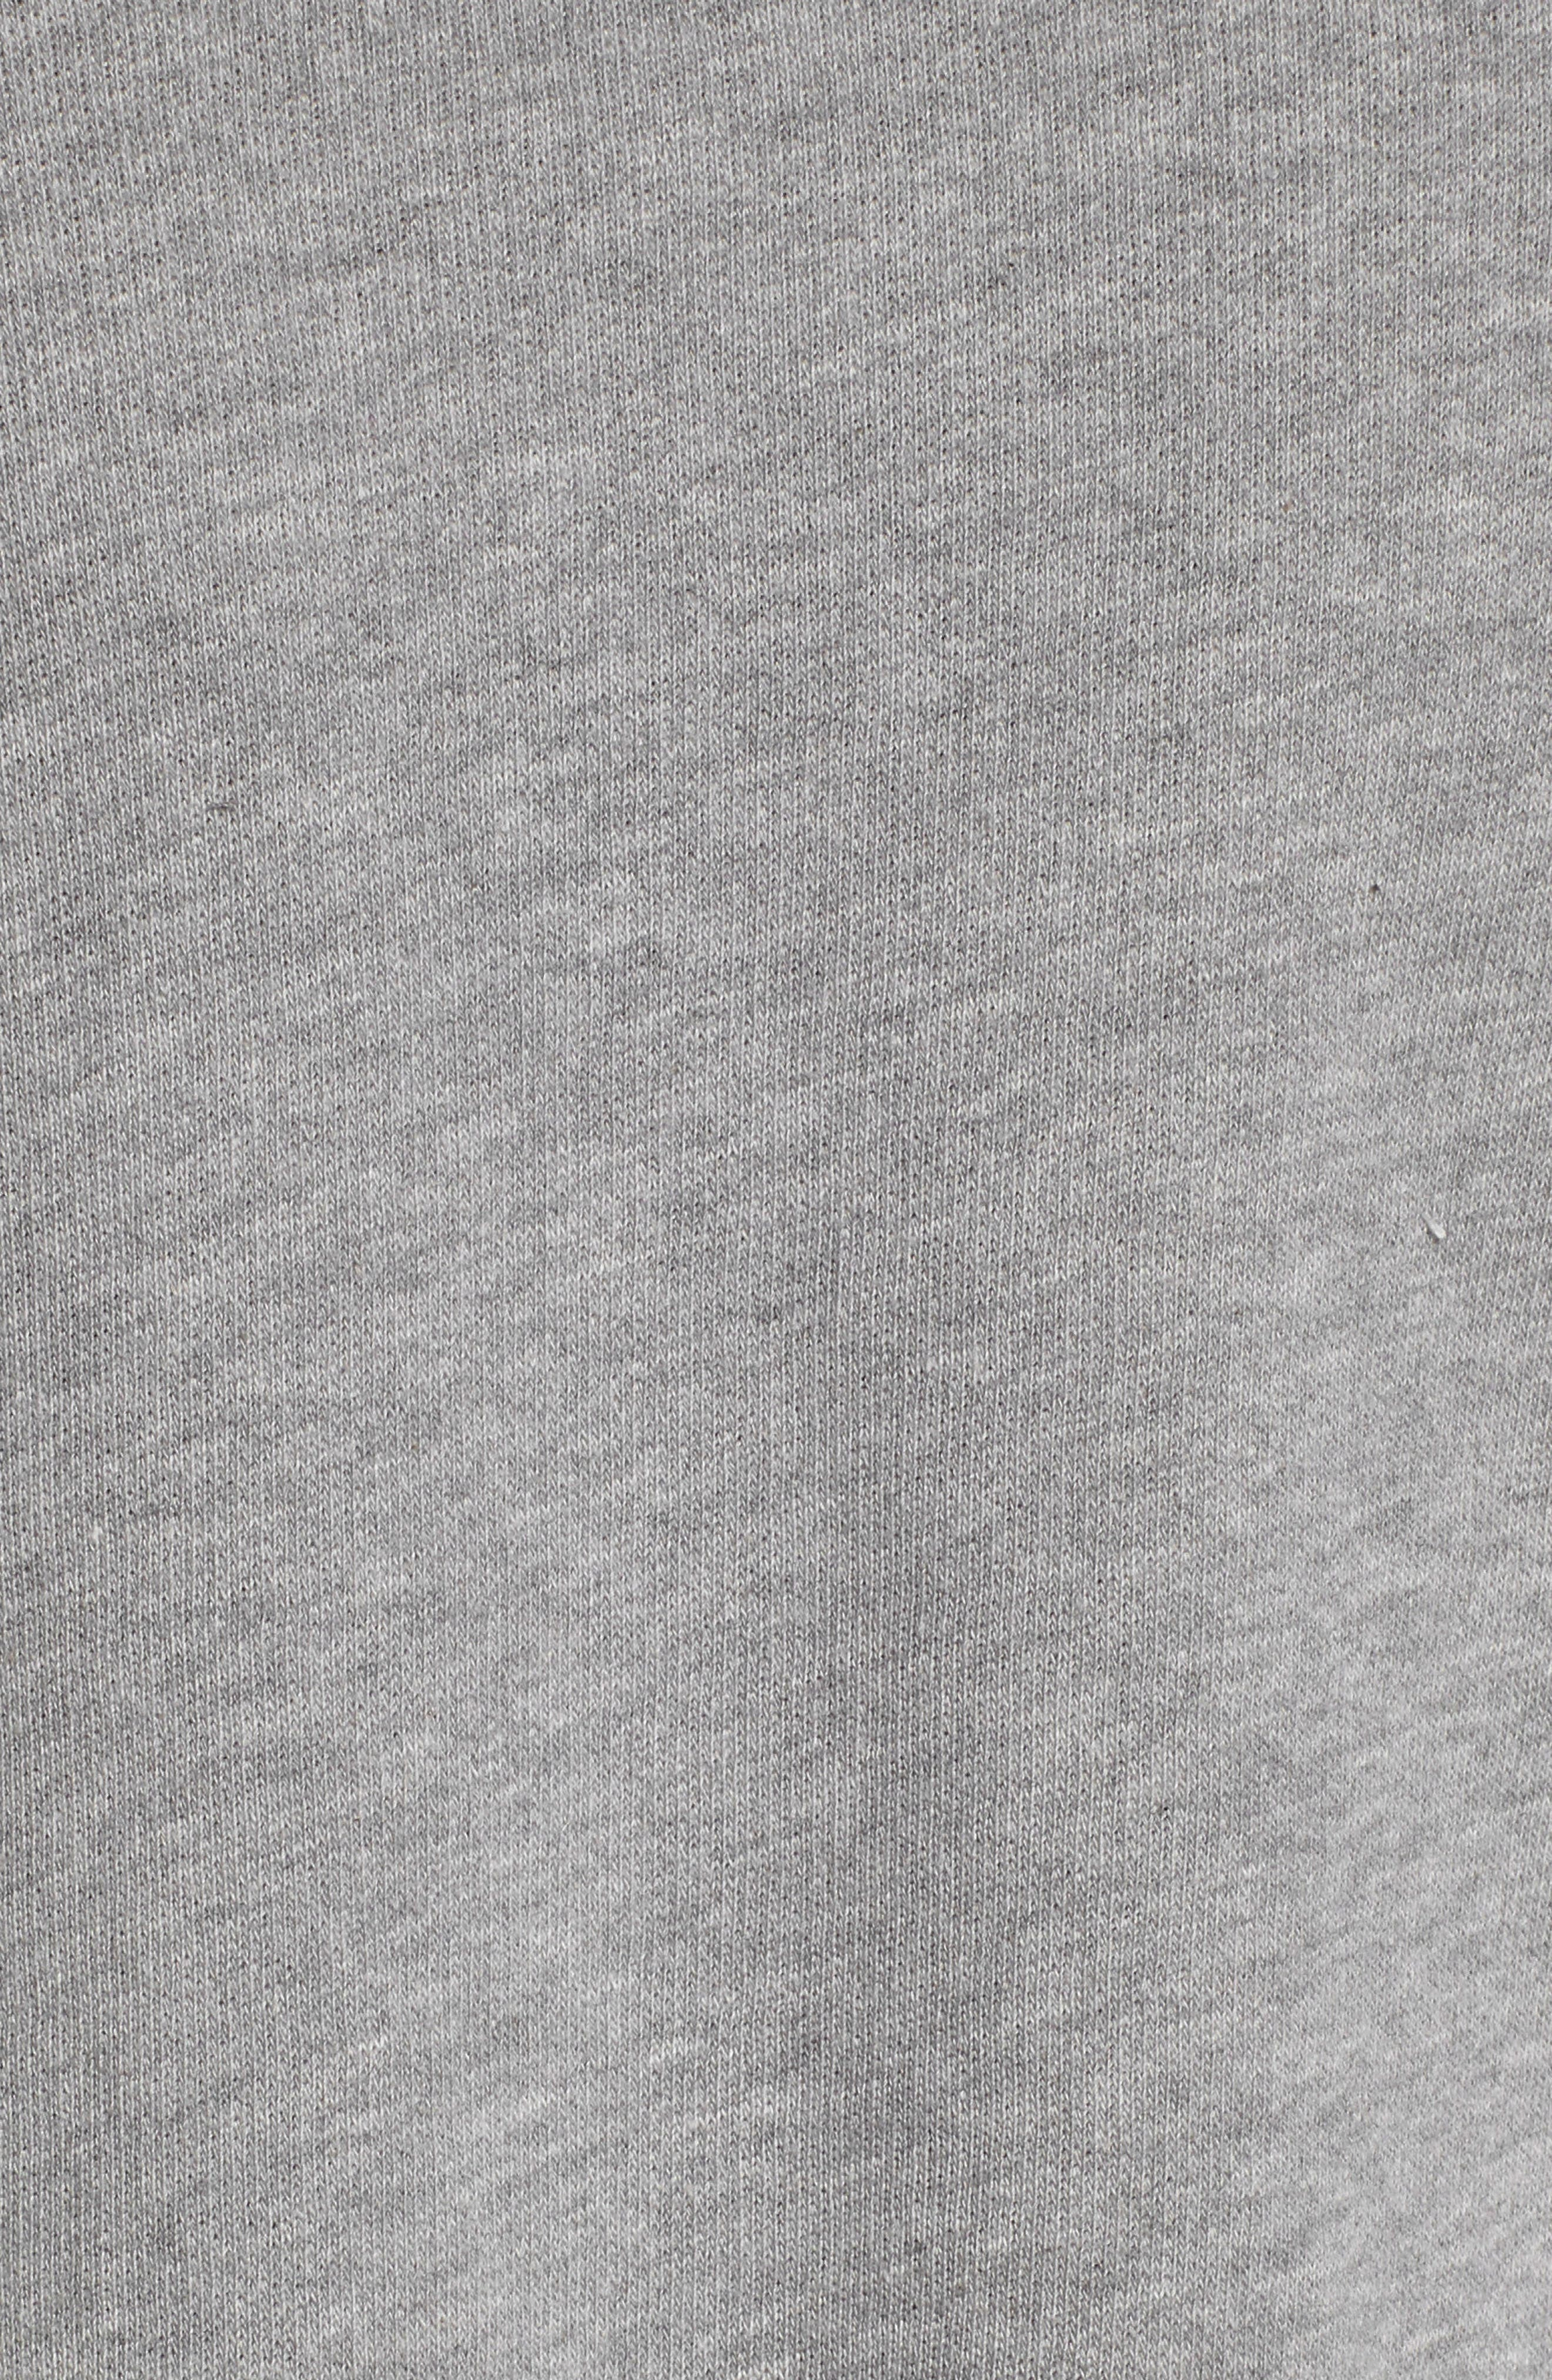 Asymmetric Ruffle Sweatshirt,                             Alternate thumbnail 5, color,                             Heather Grey